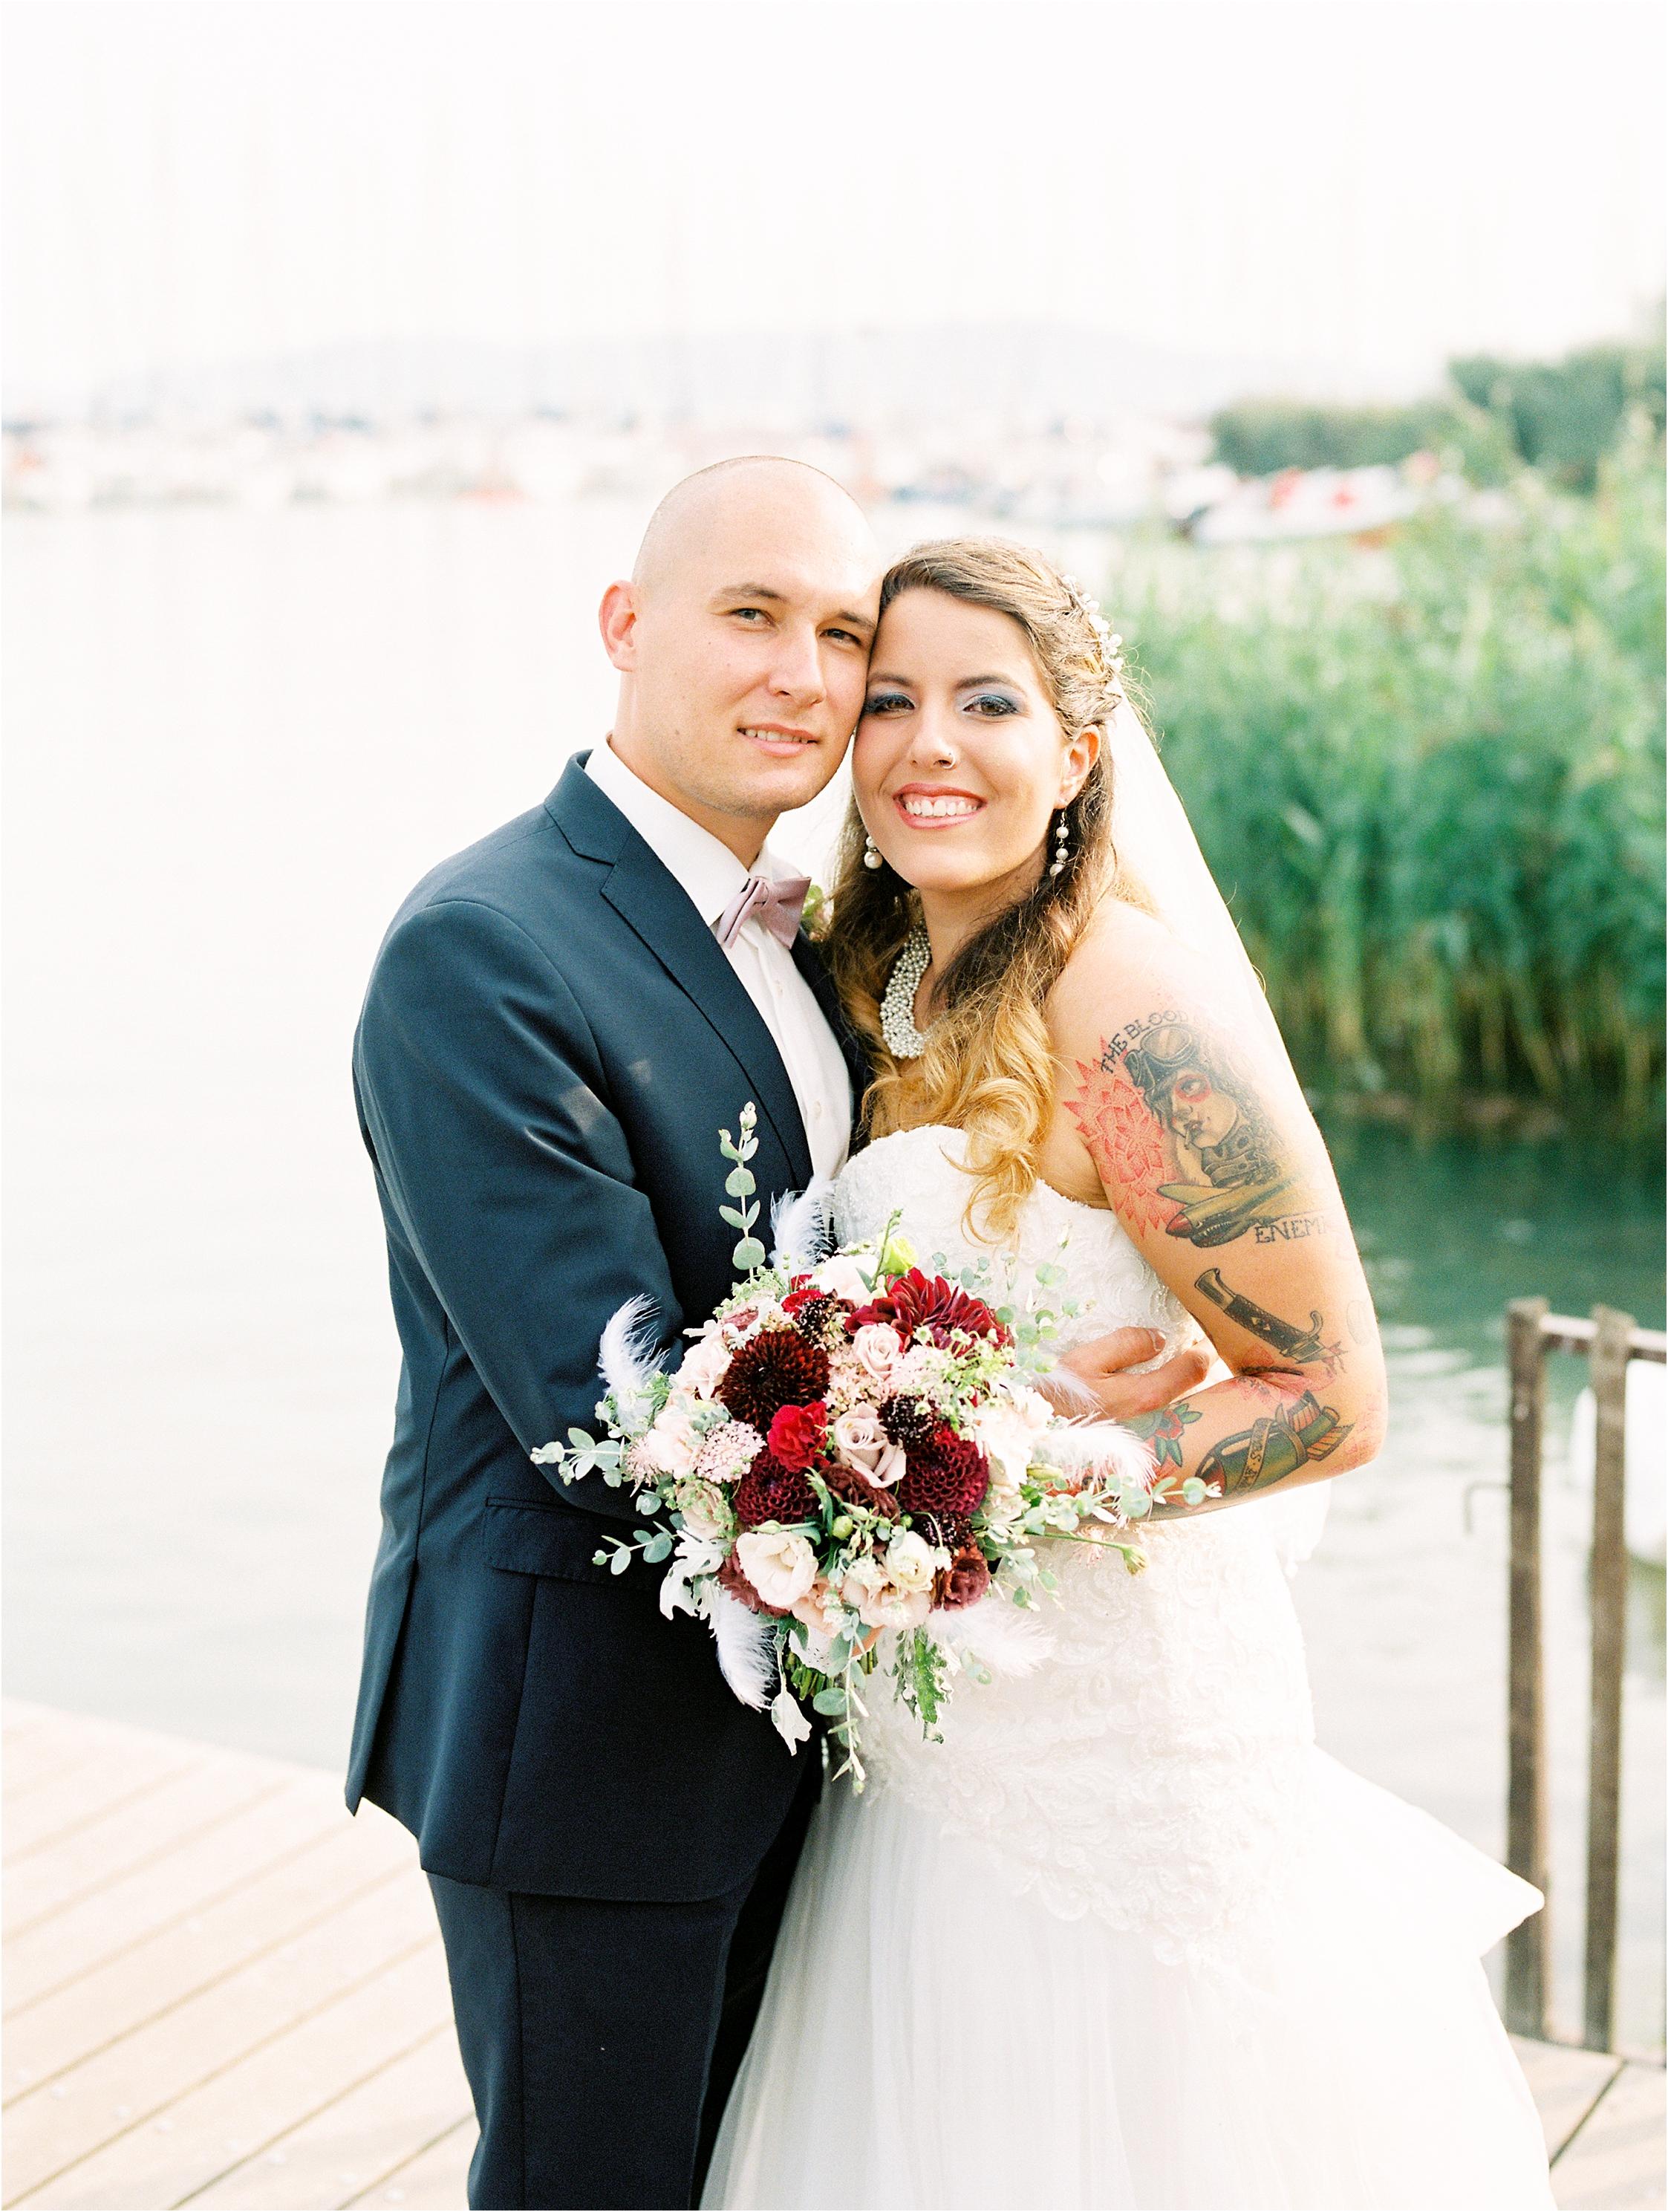 Lisa Silva Photography- Ponte Vedra Beach, St. Augustine and Jacksonville, Florida Fine Art Film Destination Wedding Photography- Hungarian Wedding- Lake Balaton, Hungary_0062.jpg